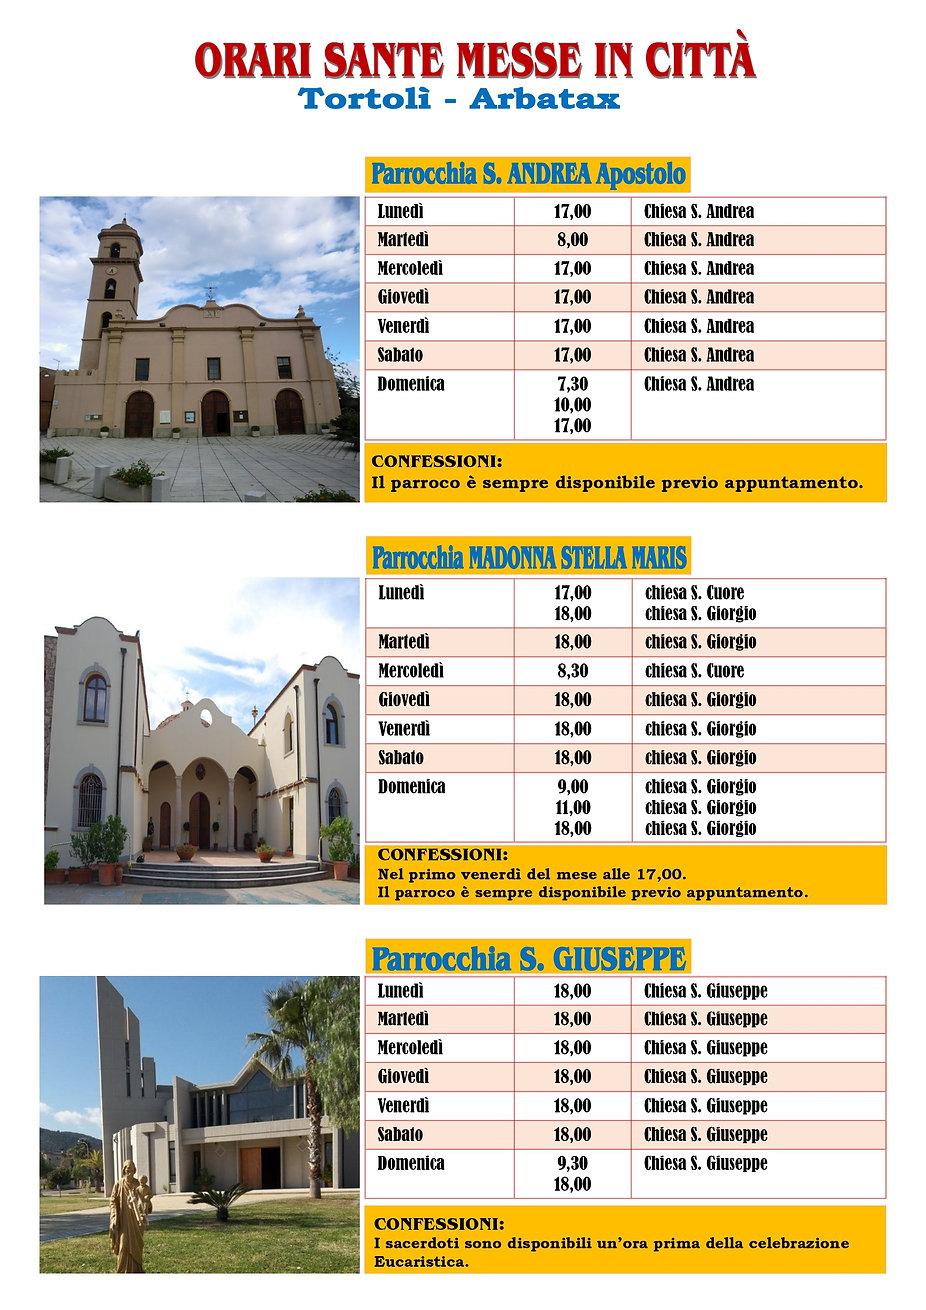 Orario Sante Messe Città Tortolì Arbatax